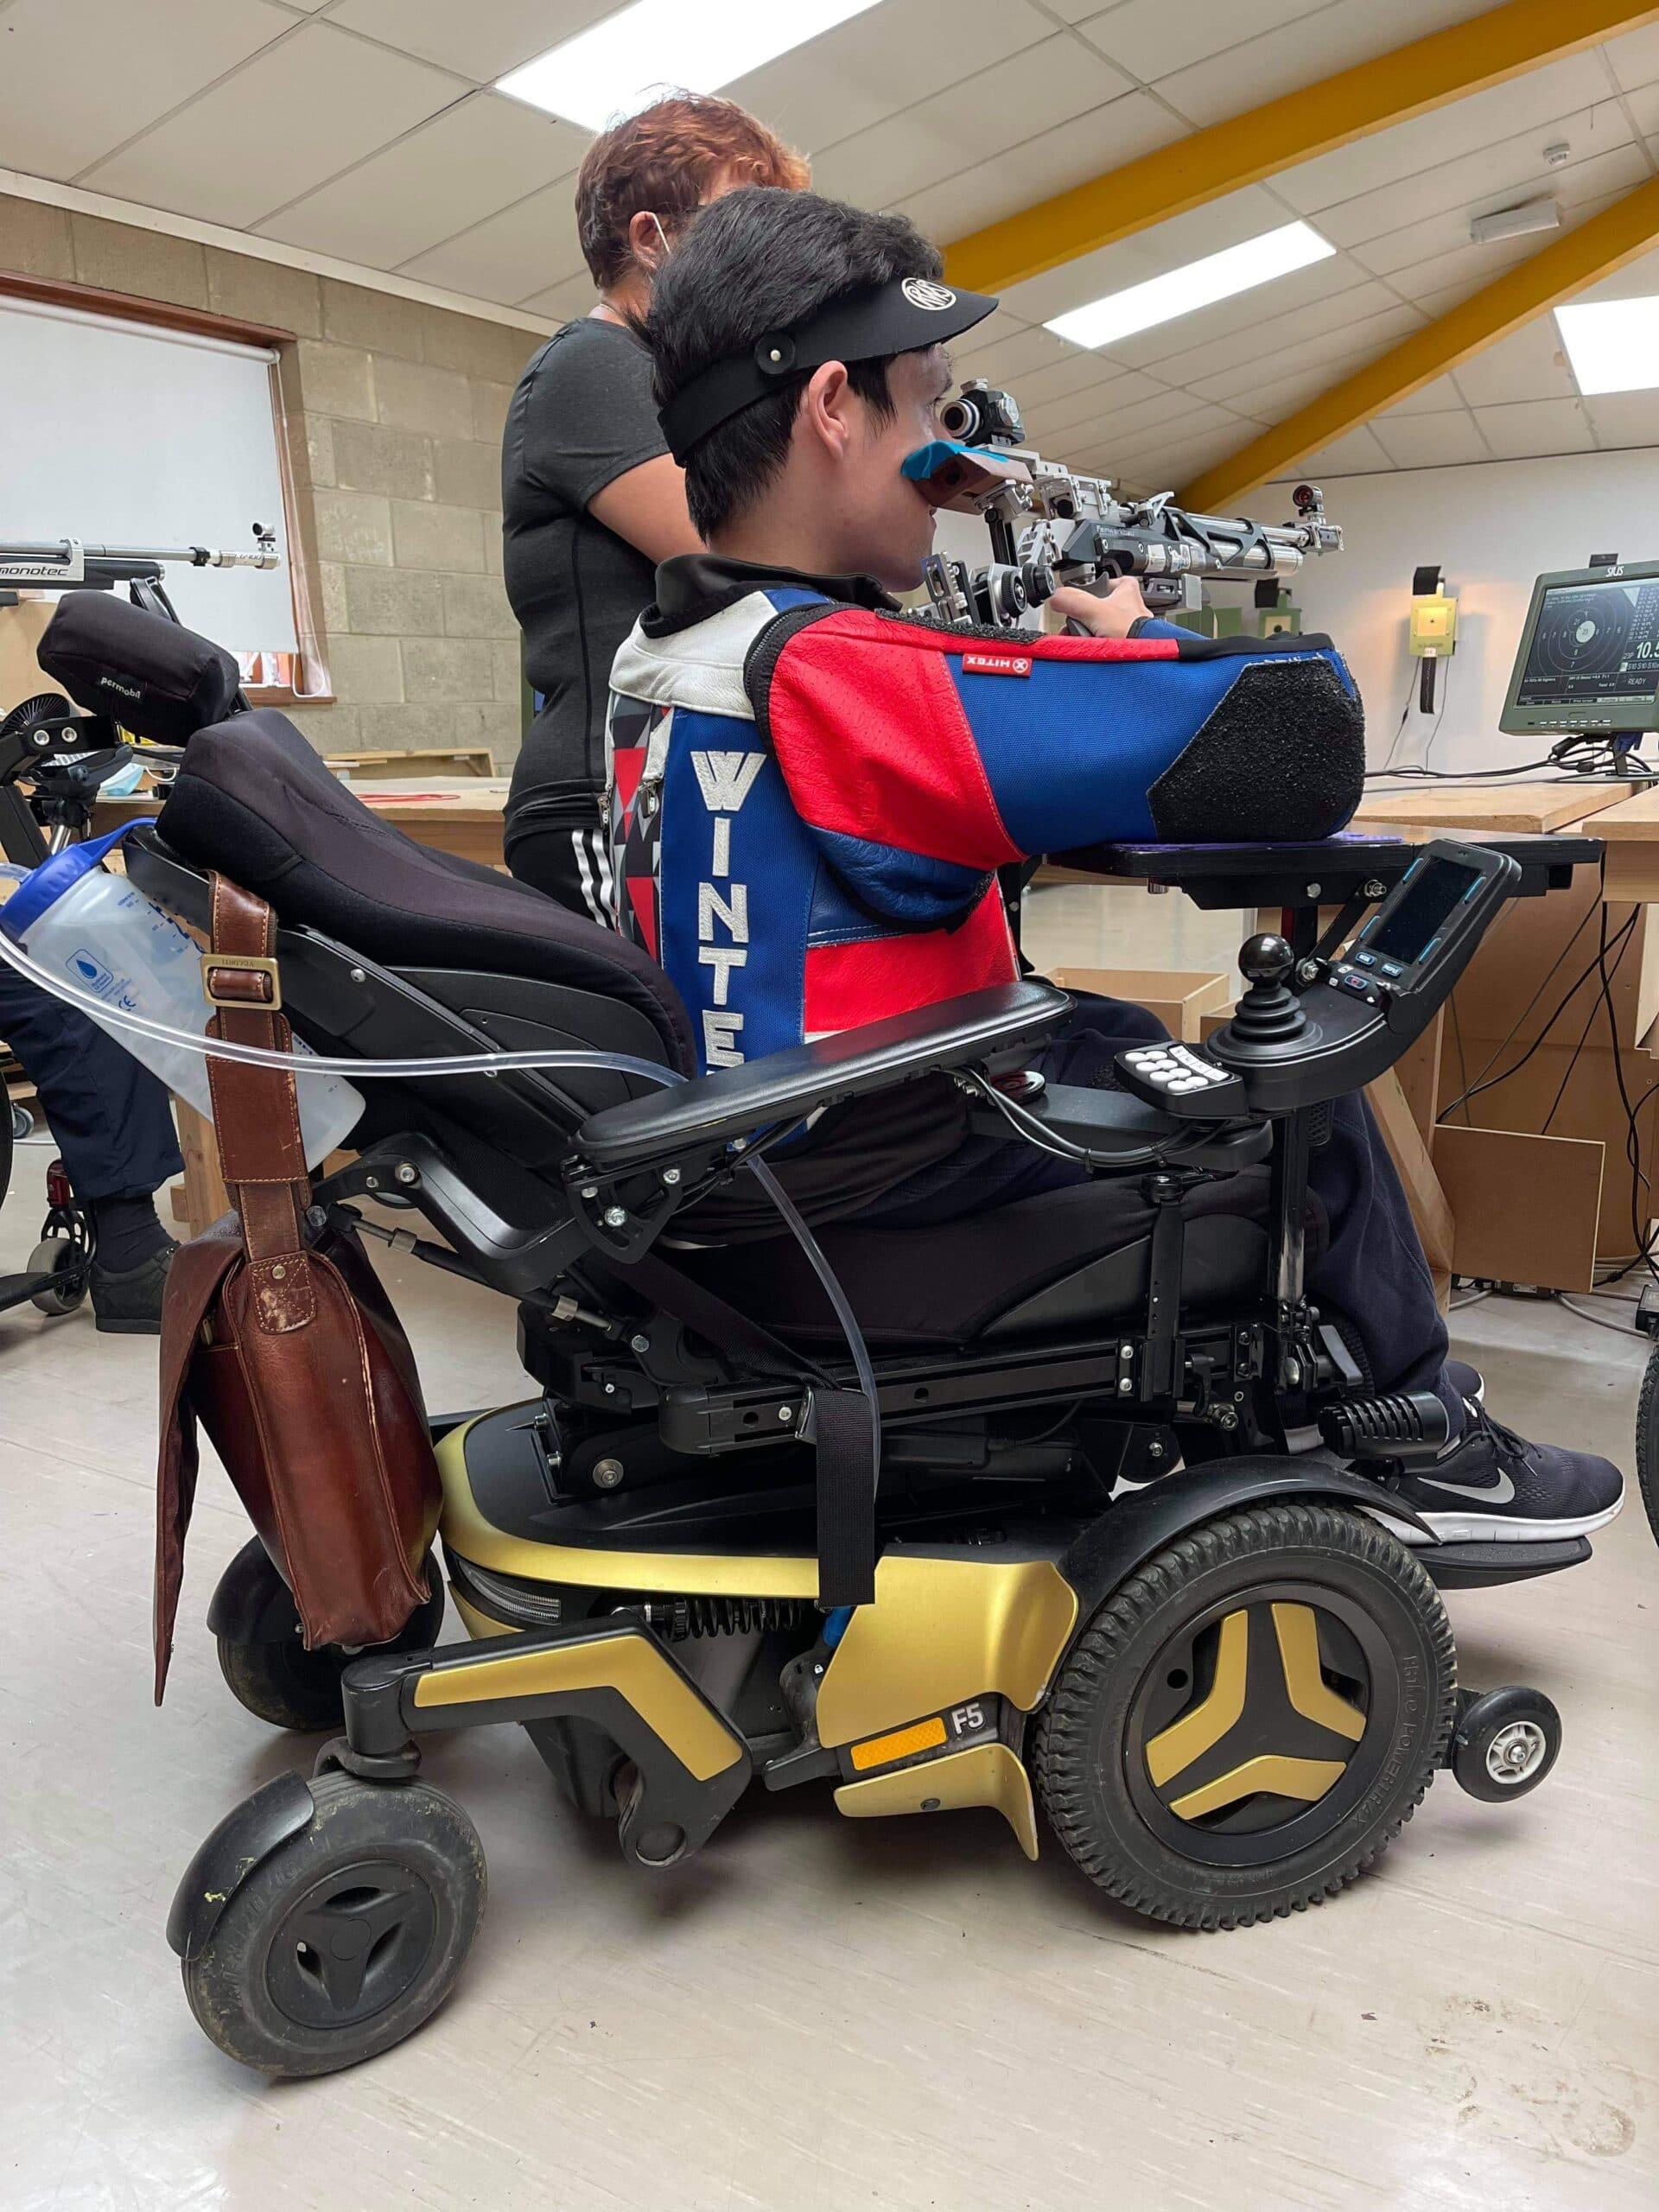 Josh demonstrating the versatility of the Permobil wheelchair